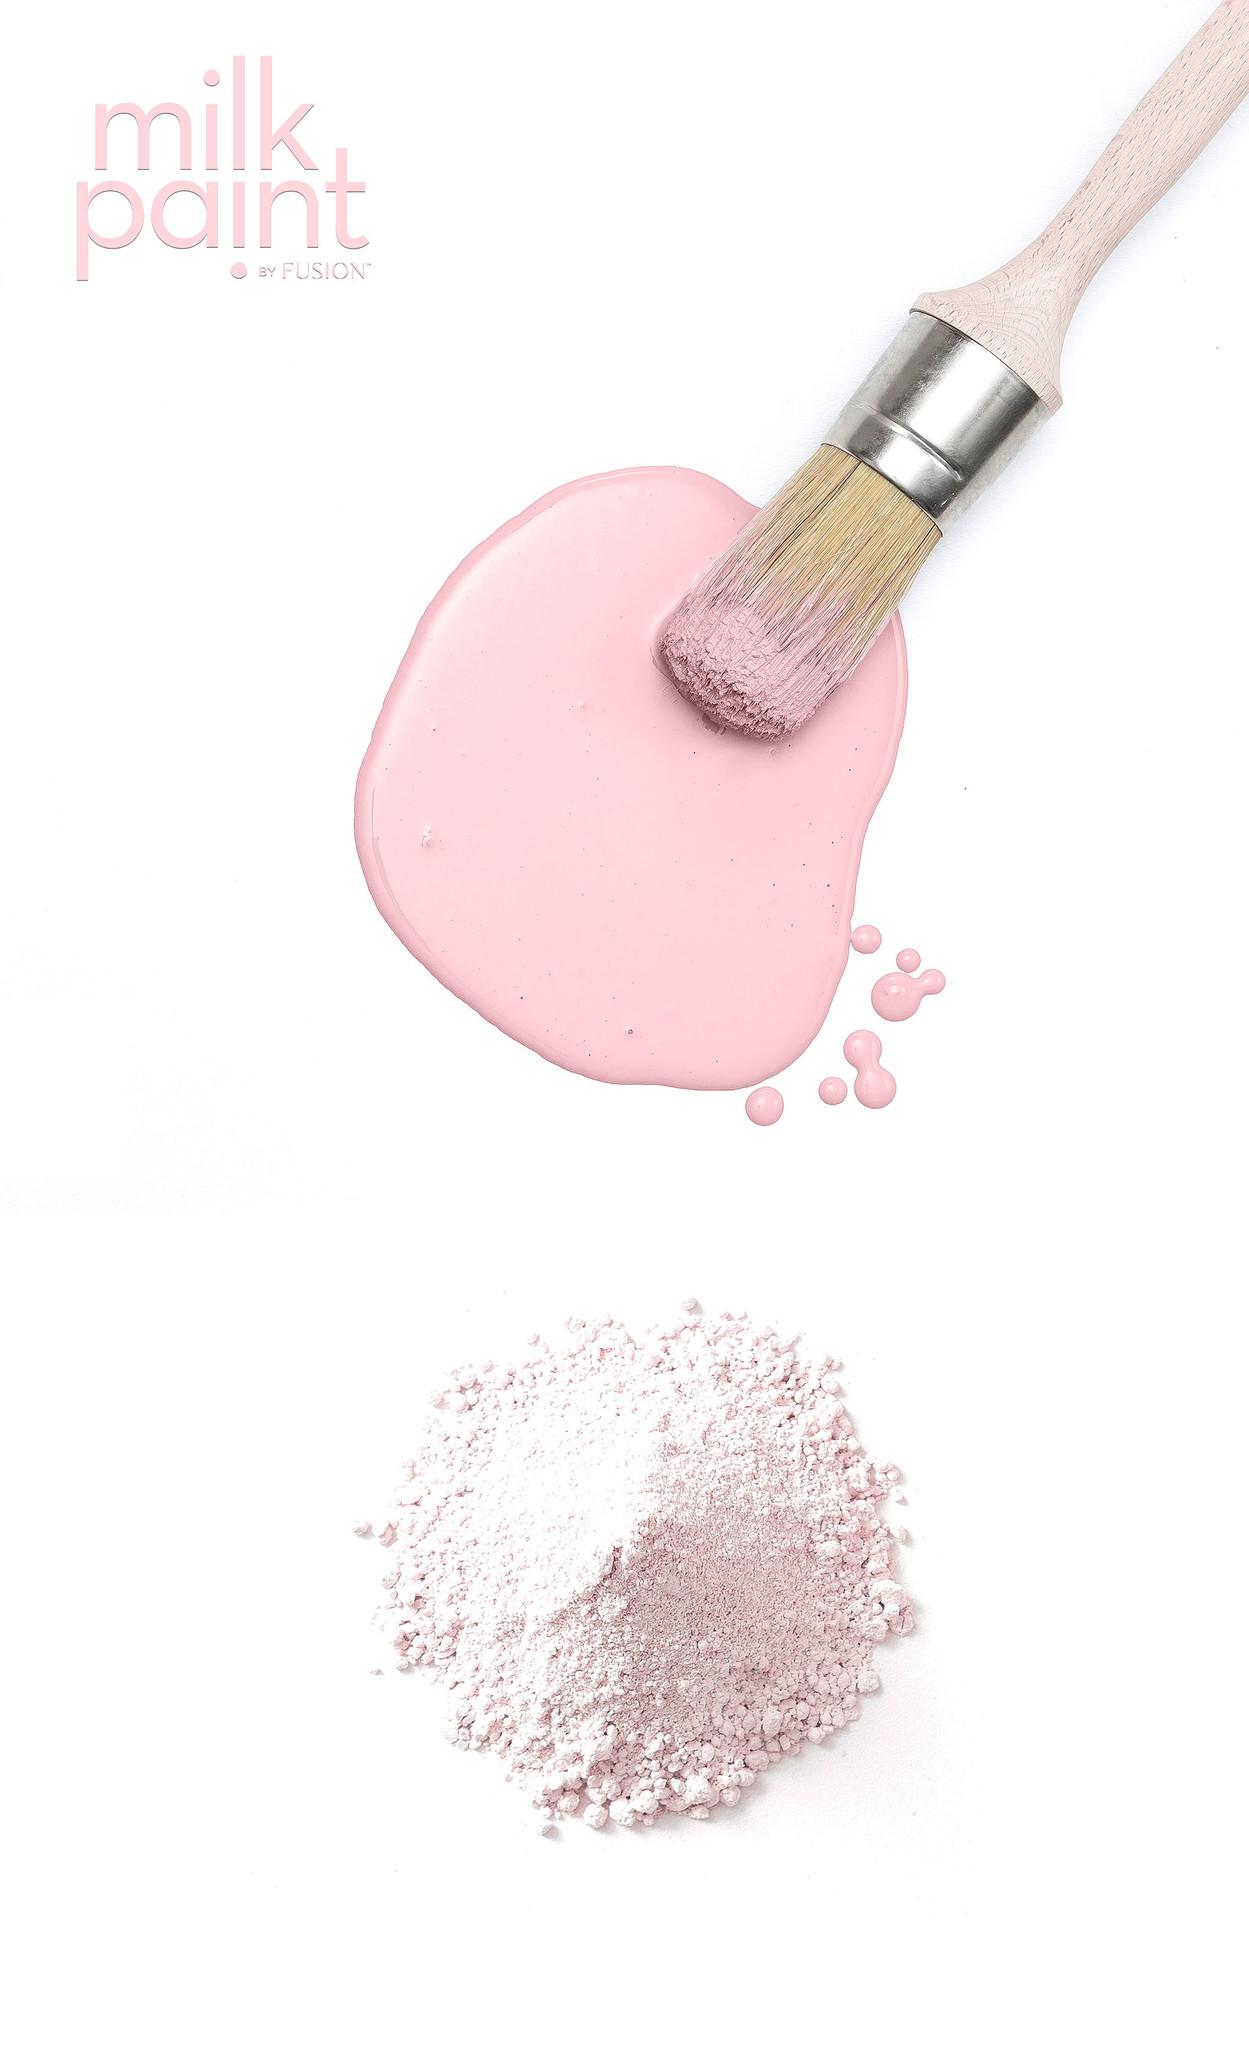 Fusion Mineral Paint Fusion - Milk Paint - Millennial Pink - 50gr